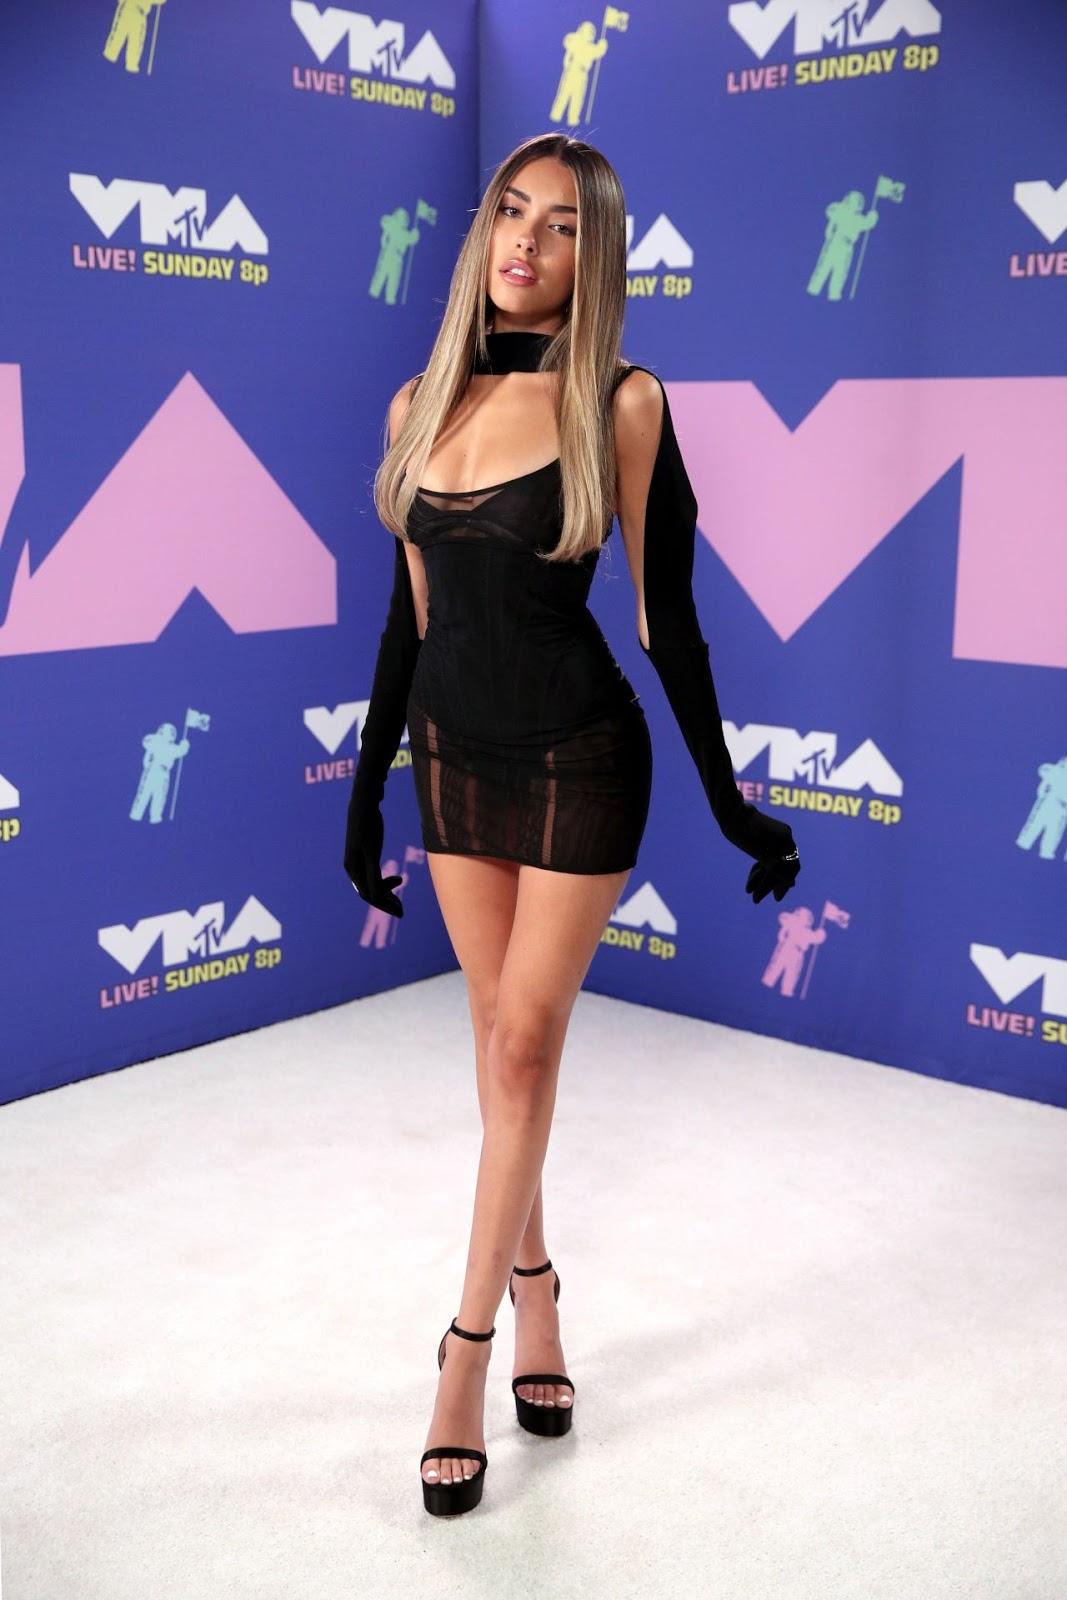 Madison Beer Dons Little Black Dress at MTV VMAs 2020